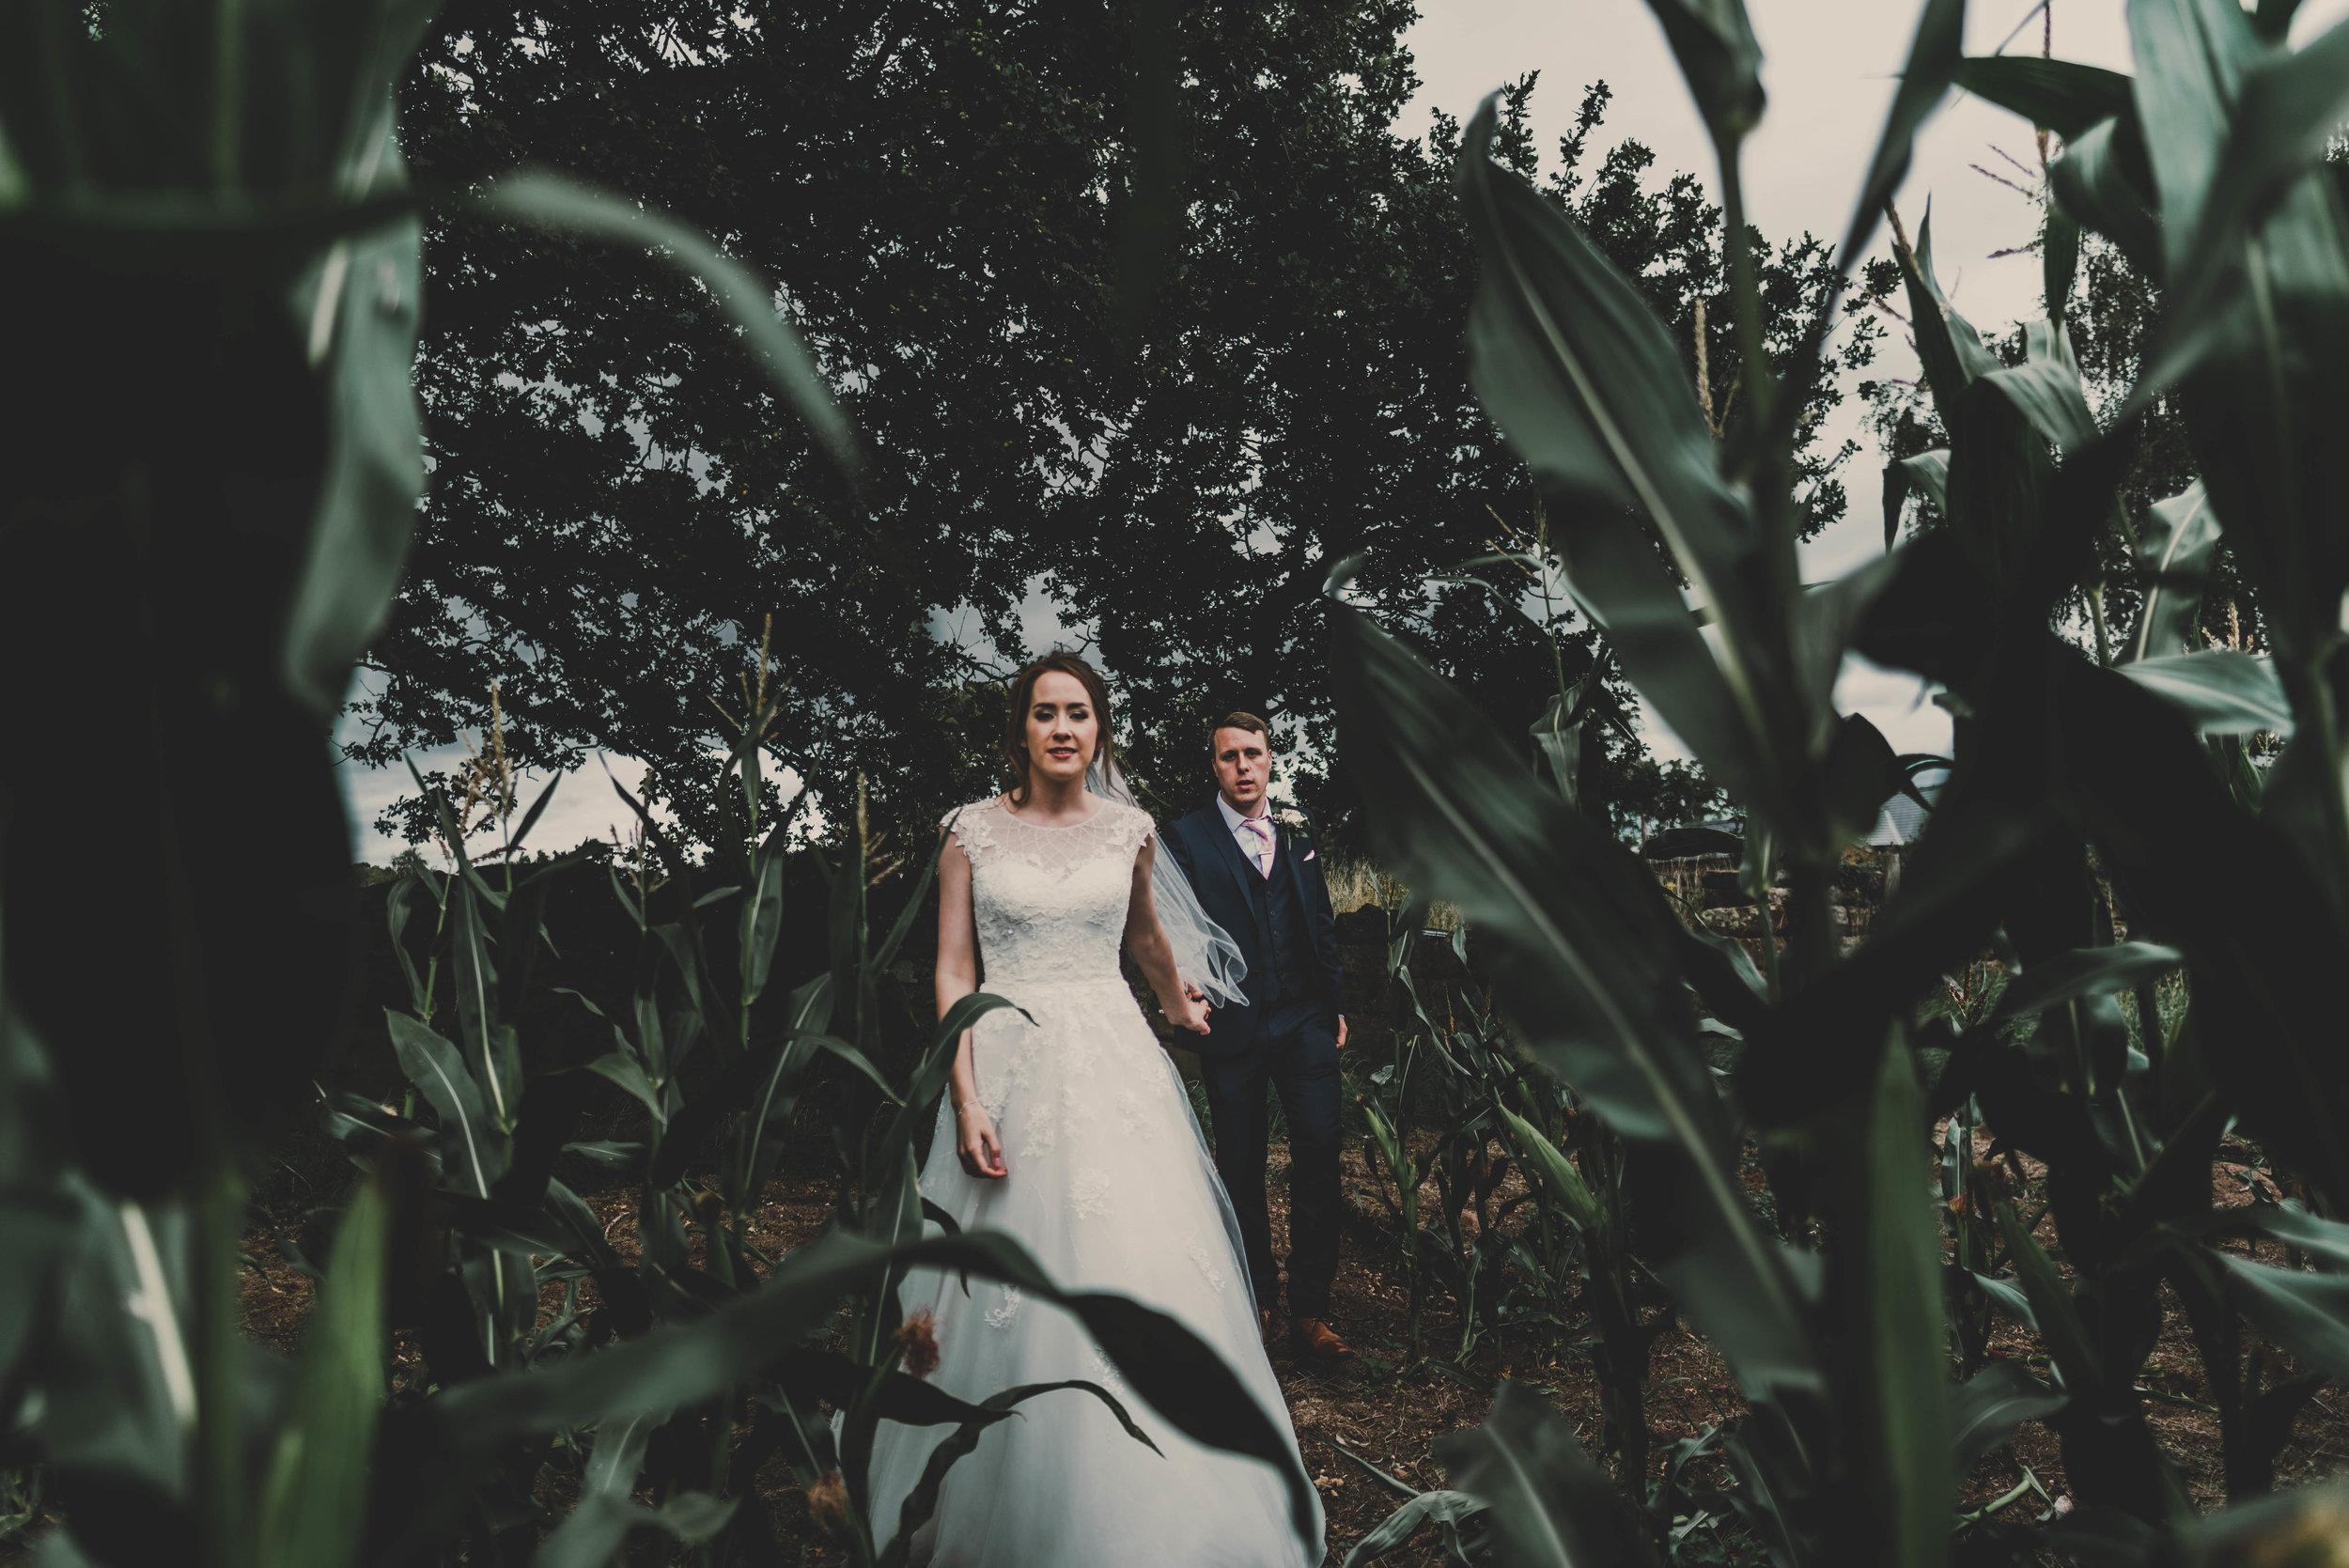 WEDDING: A dreamy DIY rustic chic wedding - Cock O Barton